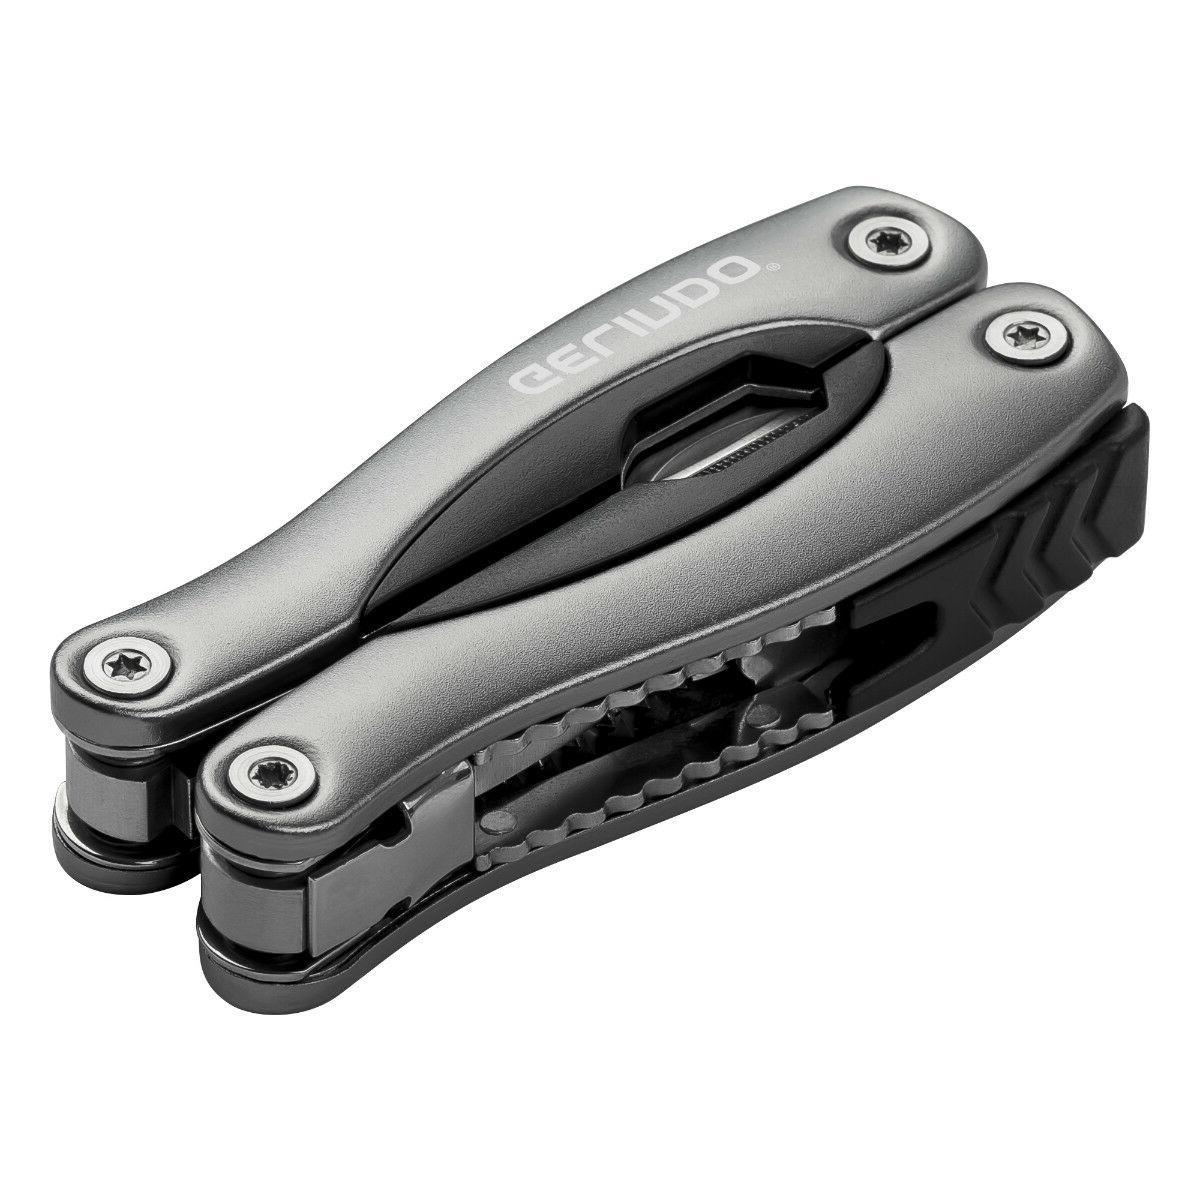 Multi Plier Screwdriver Hiking Gear